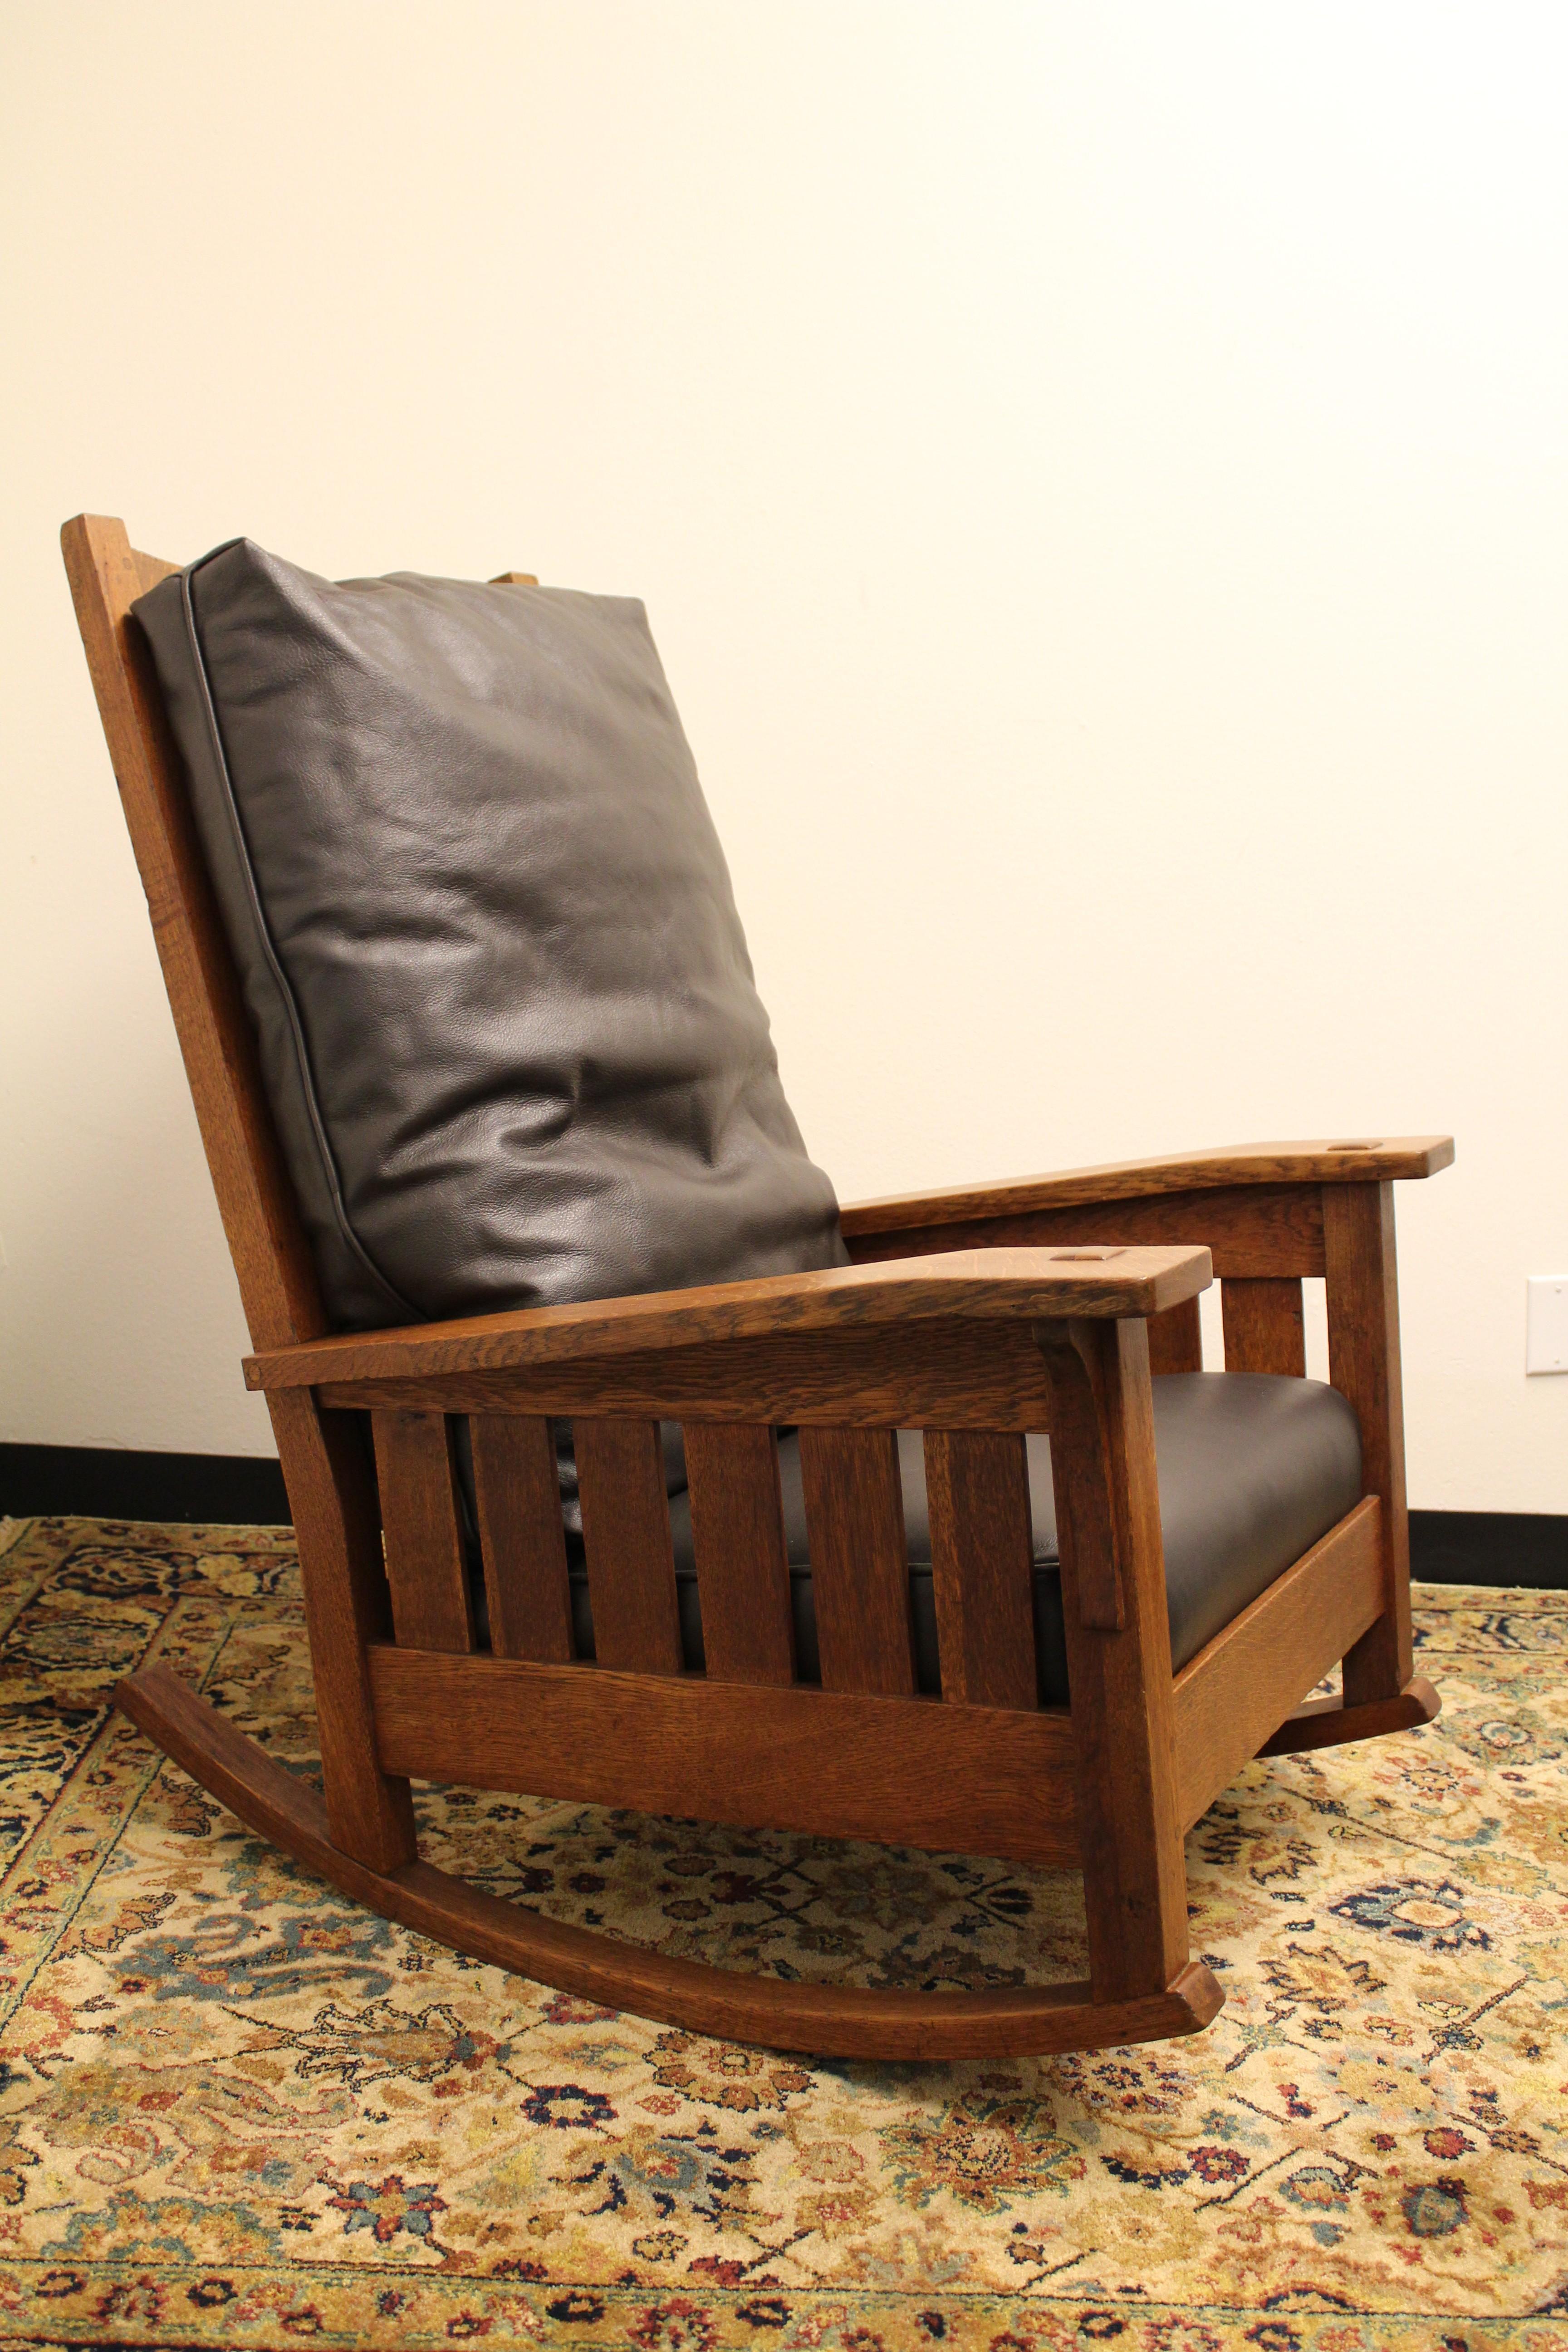 wayfair bent by bryce simmons rocker loon recliner peak arm reviews pdx furniture upholstery